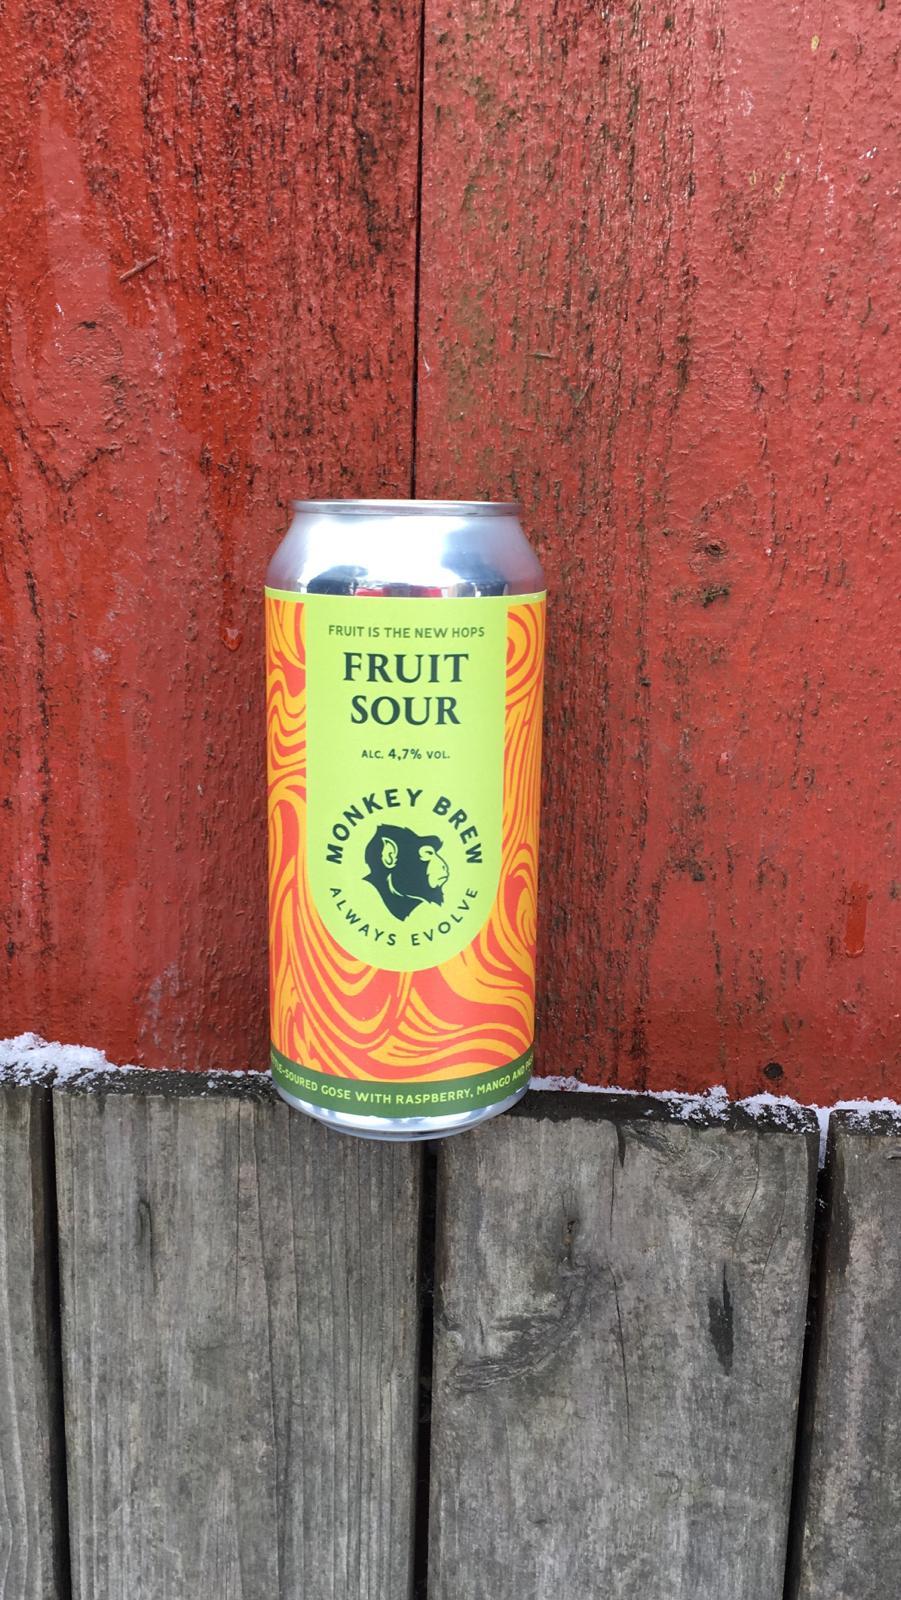 Fruit is the New Hops - Monkey Brew - 440ml